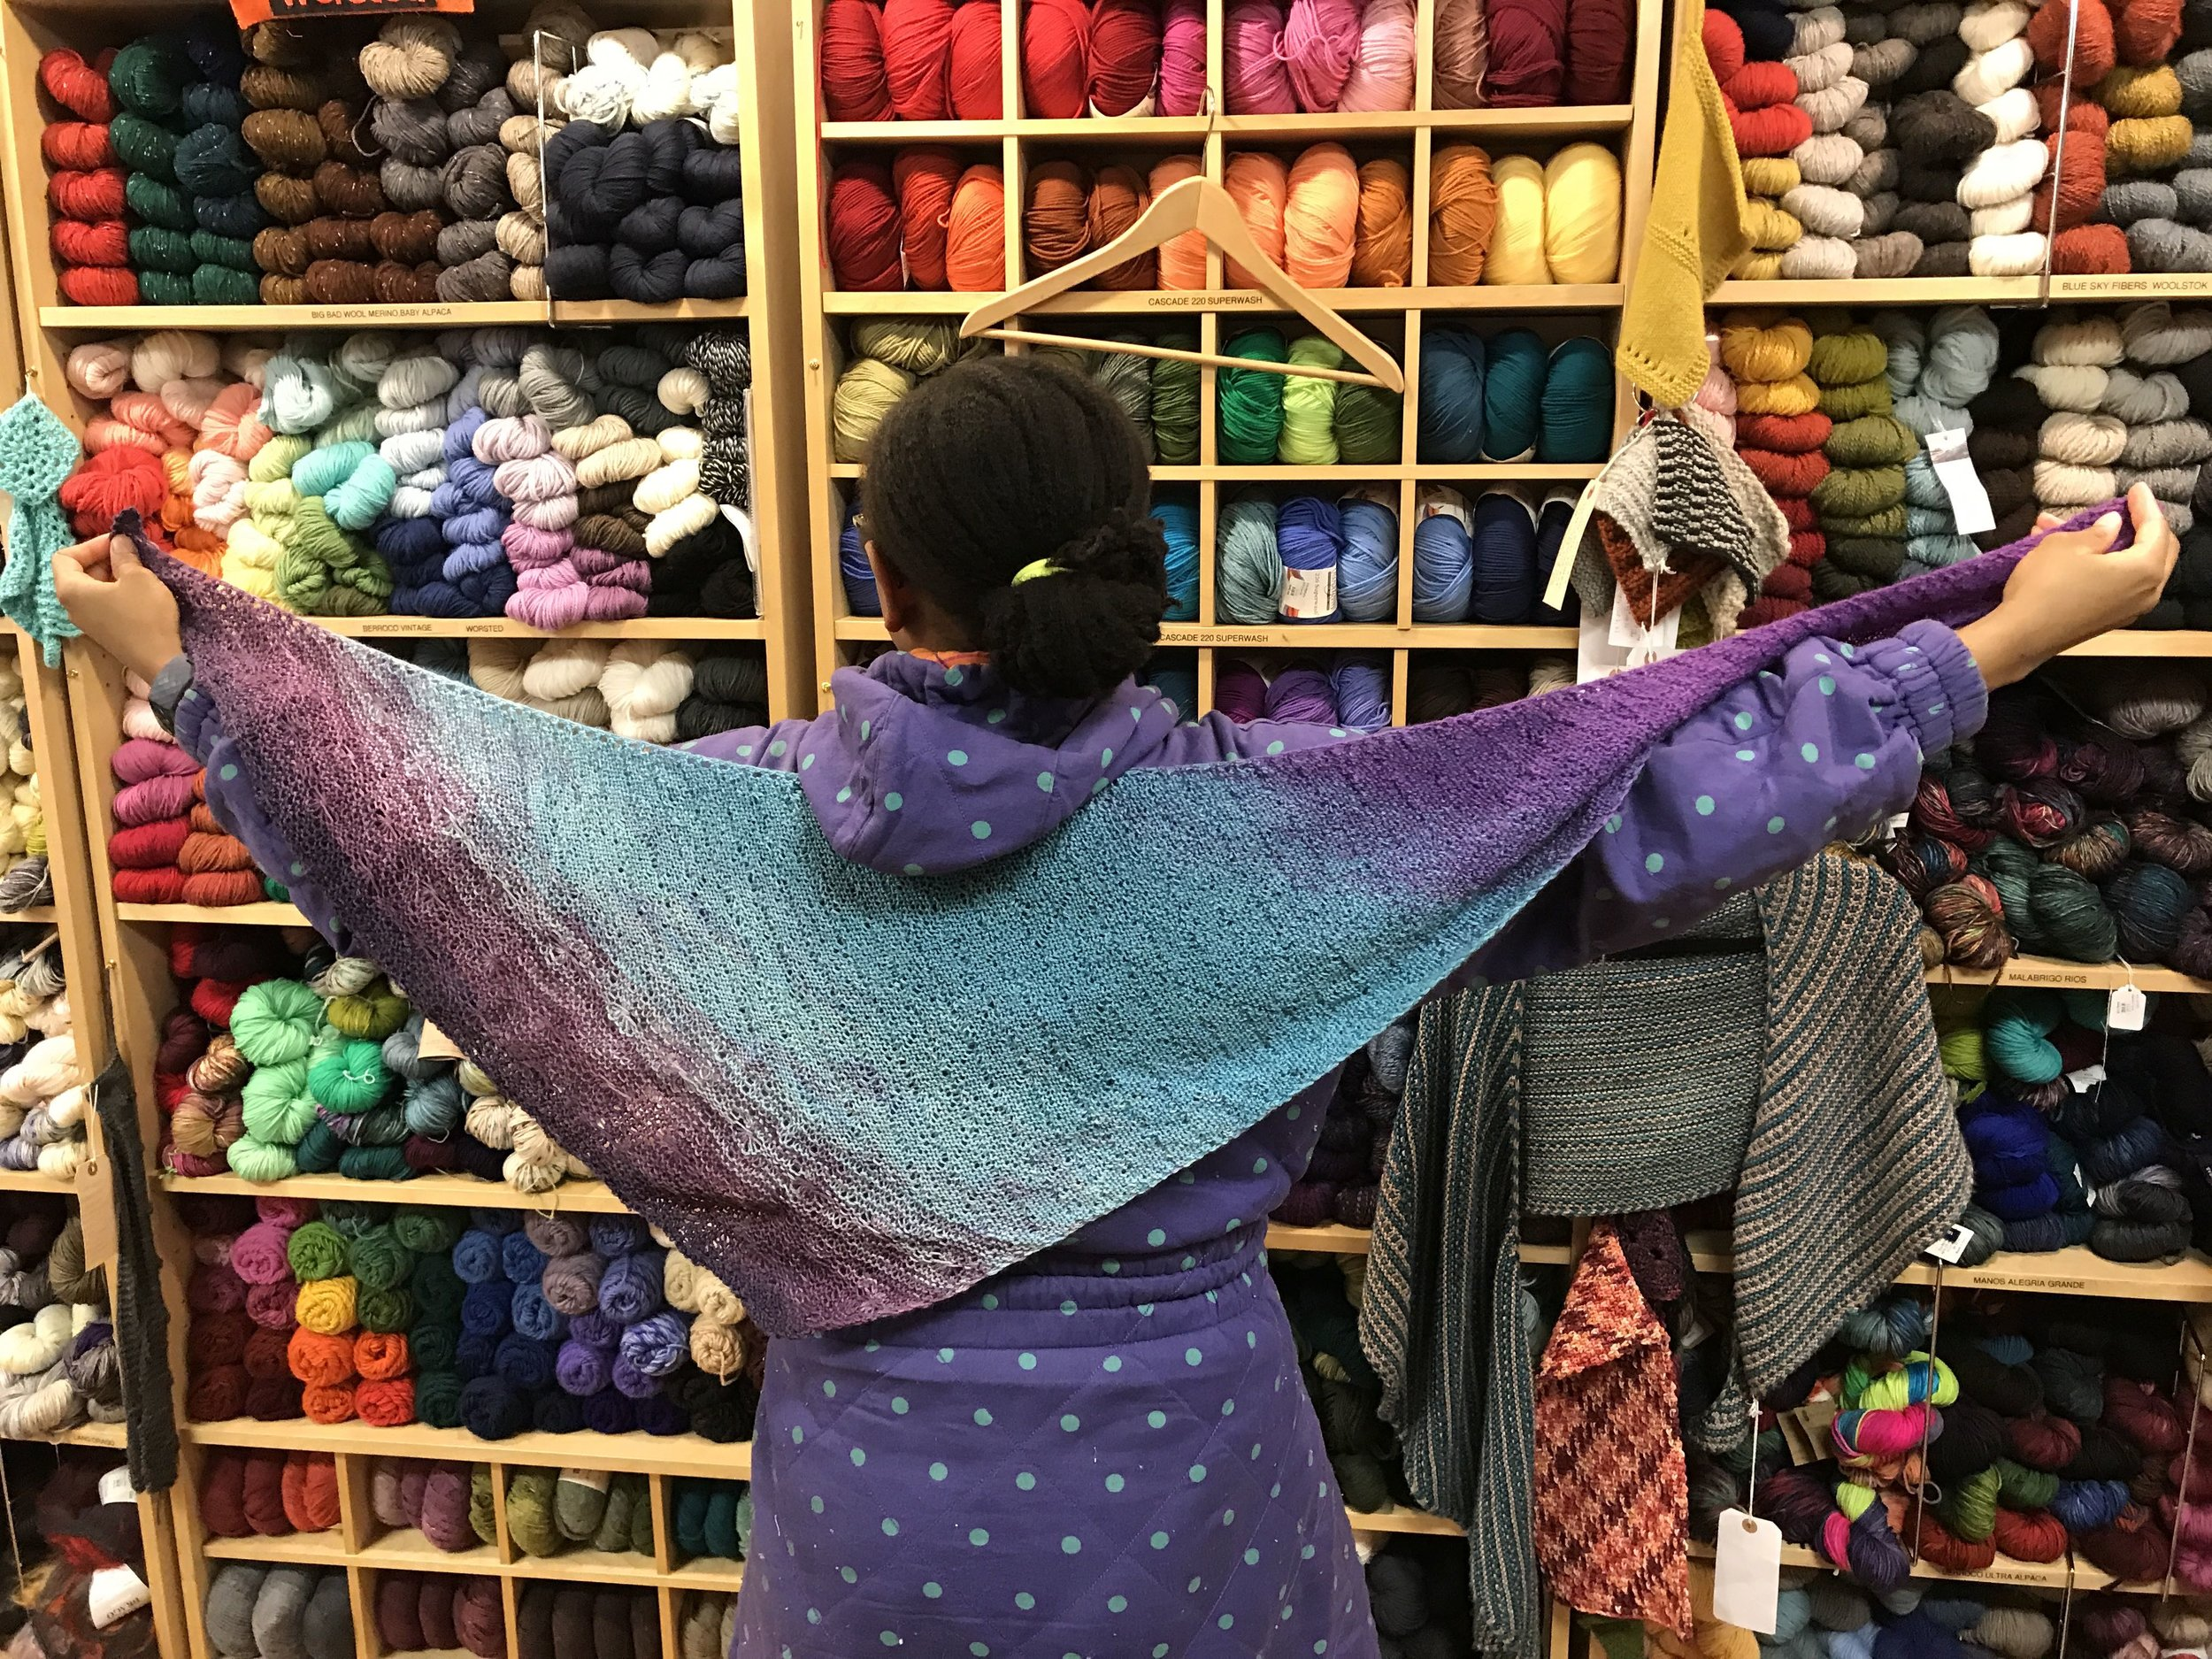 Colorful shawl knitted by Daniel Casanova-Vazquez  Value $150.-  Starting Bid $75.-